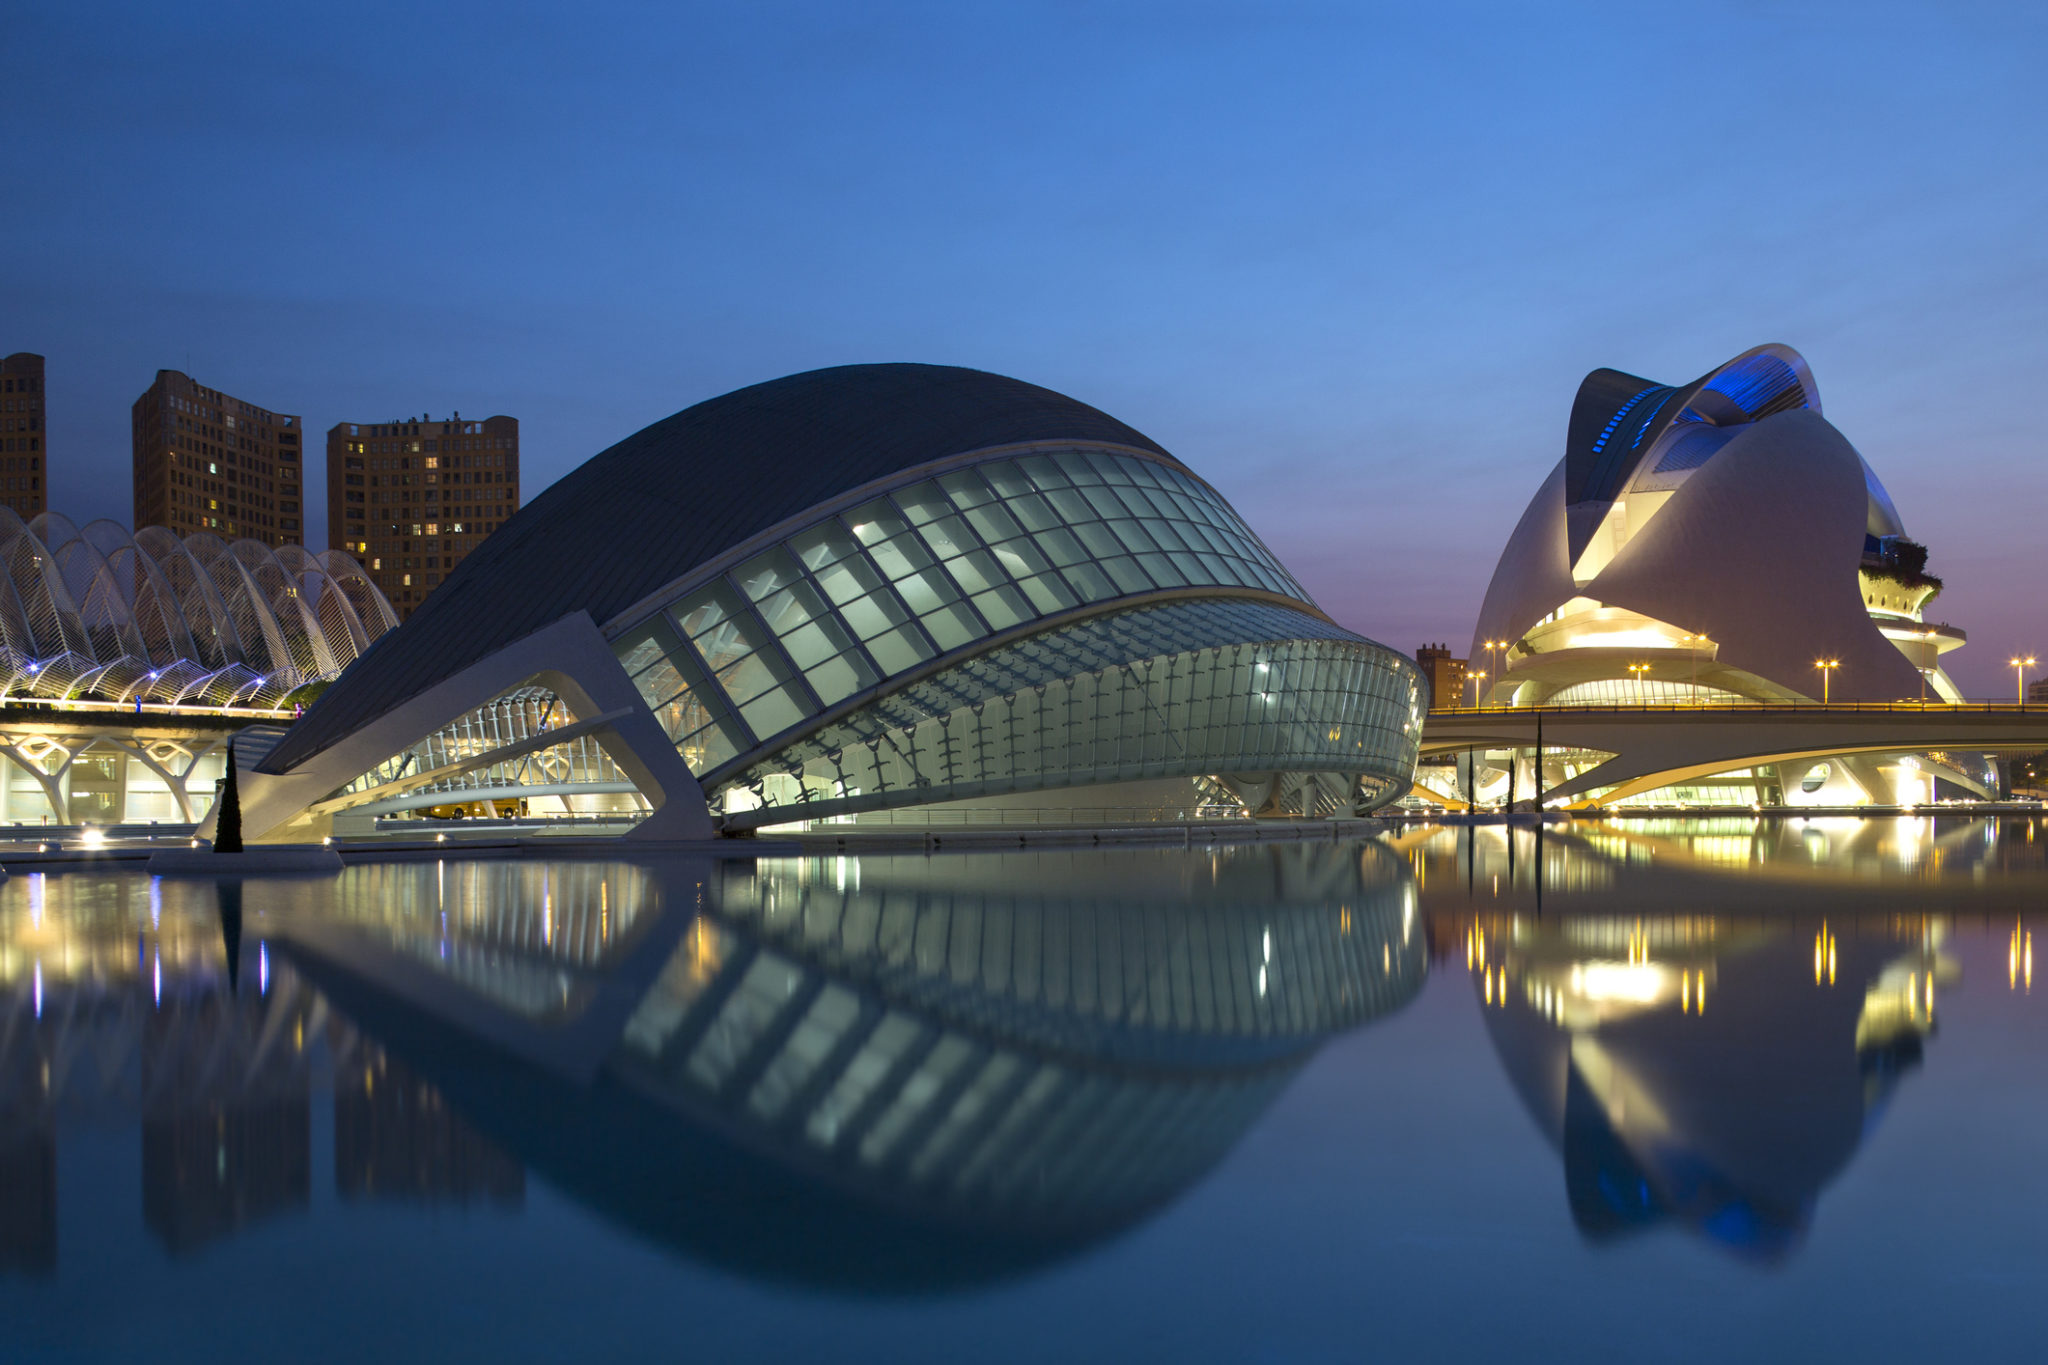 Miasteczko Sztuki i Nauki w Walencji (Ciudad de las Artes y las Ciencias)